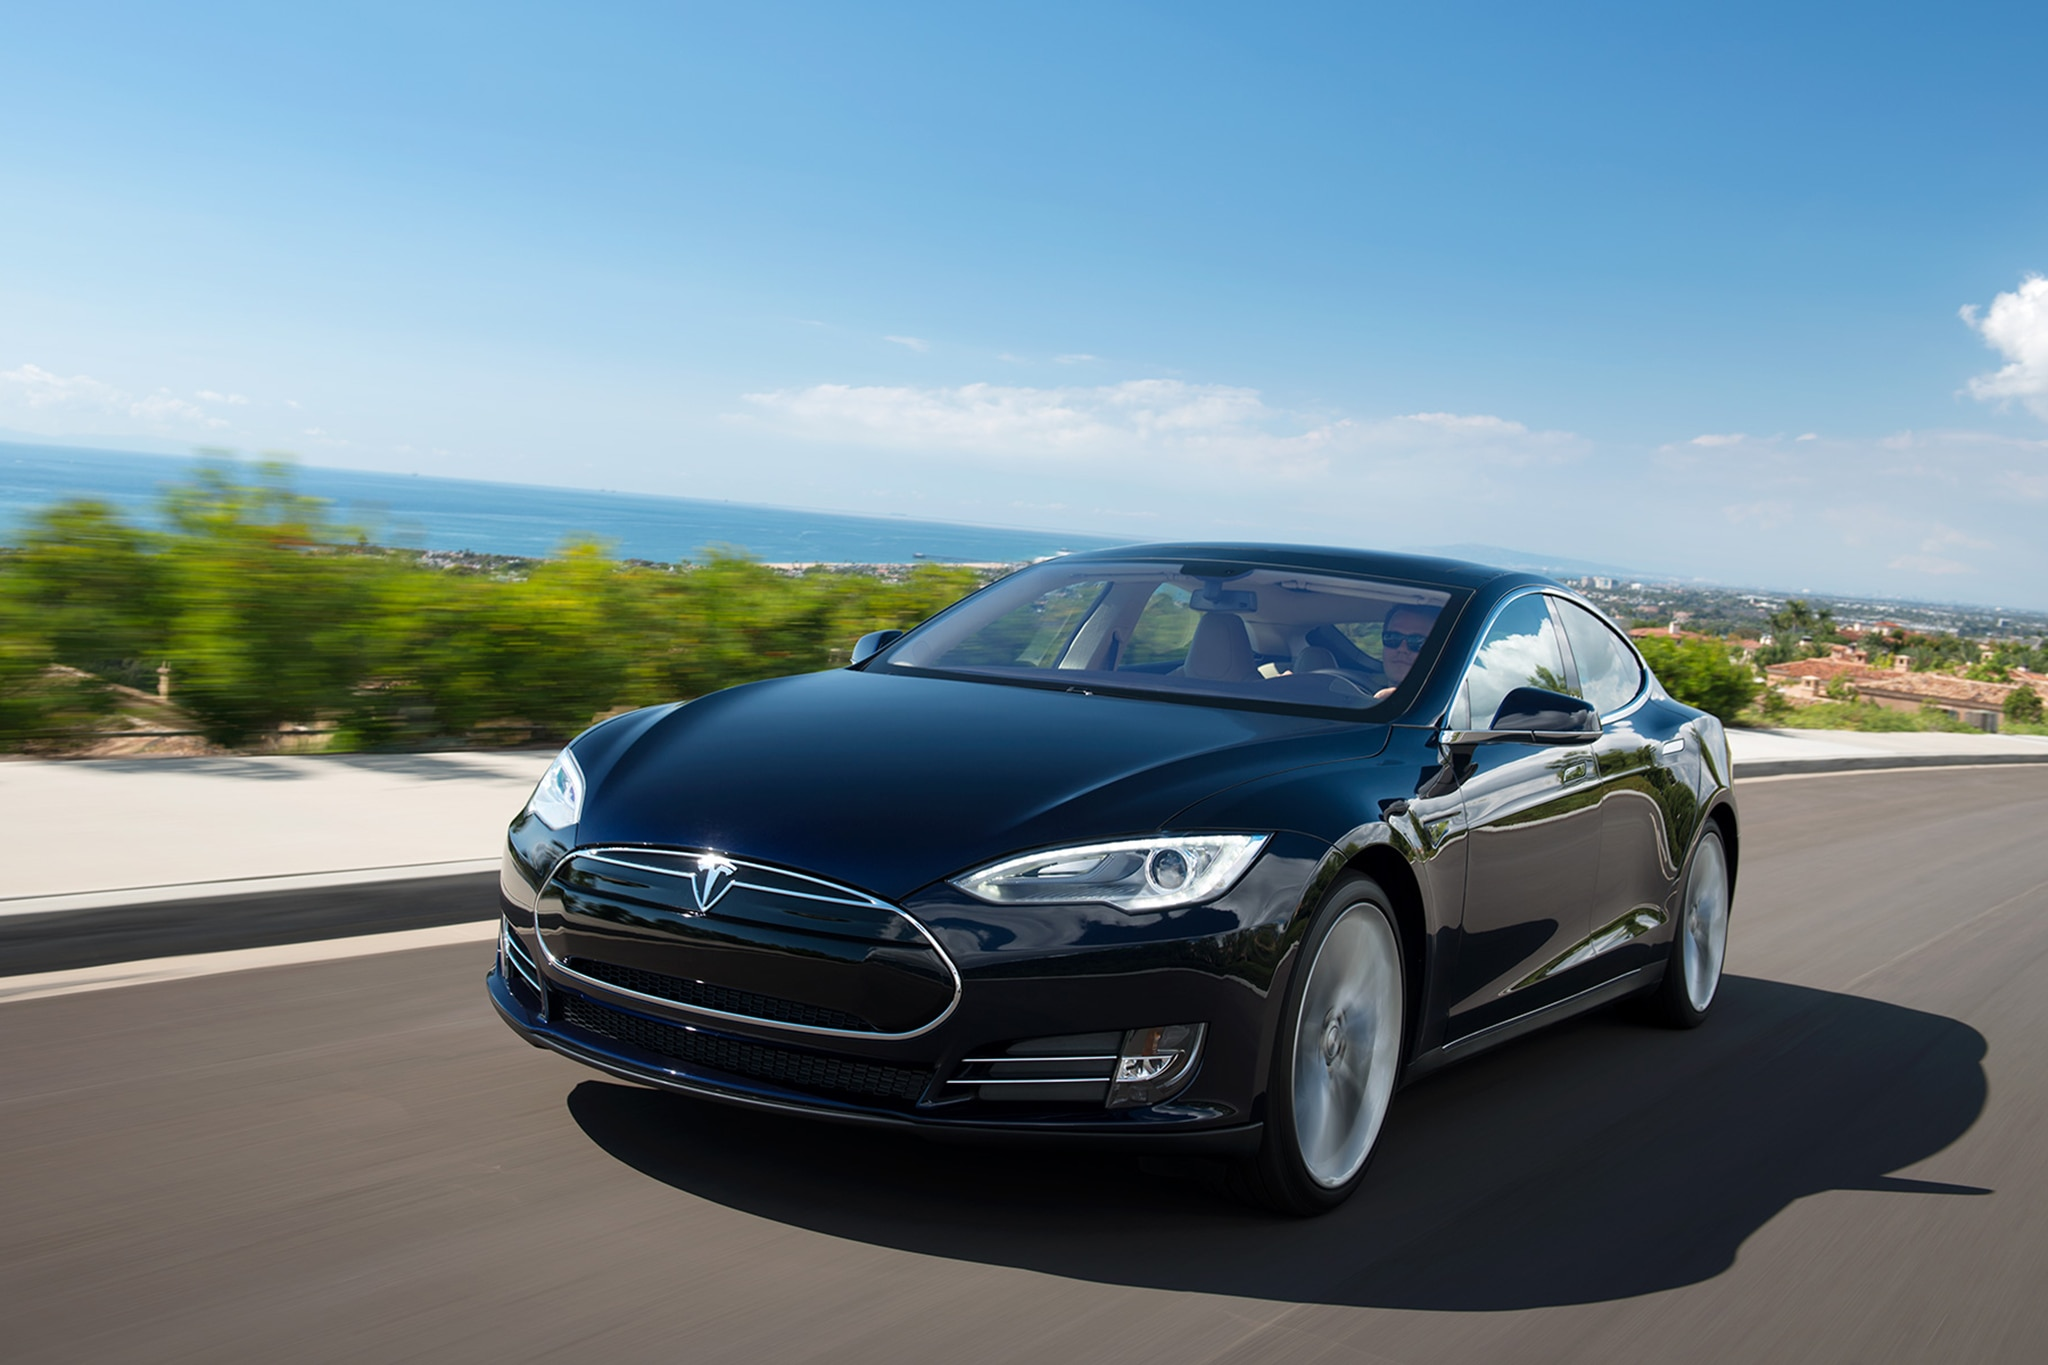 2014 Tesla Model S Three Quarters In Motion1